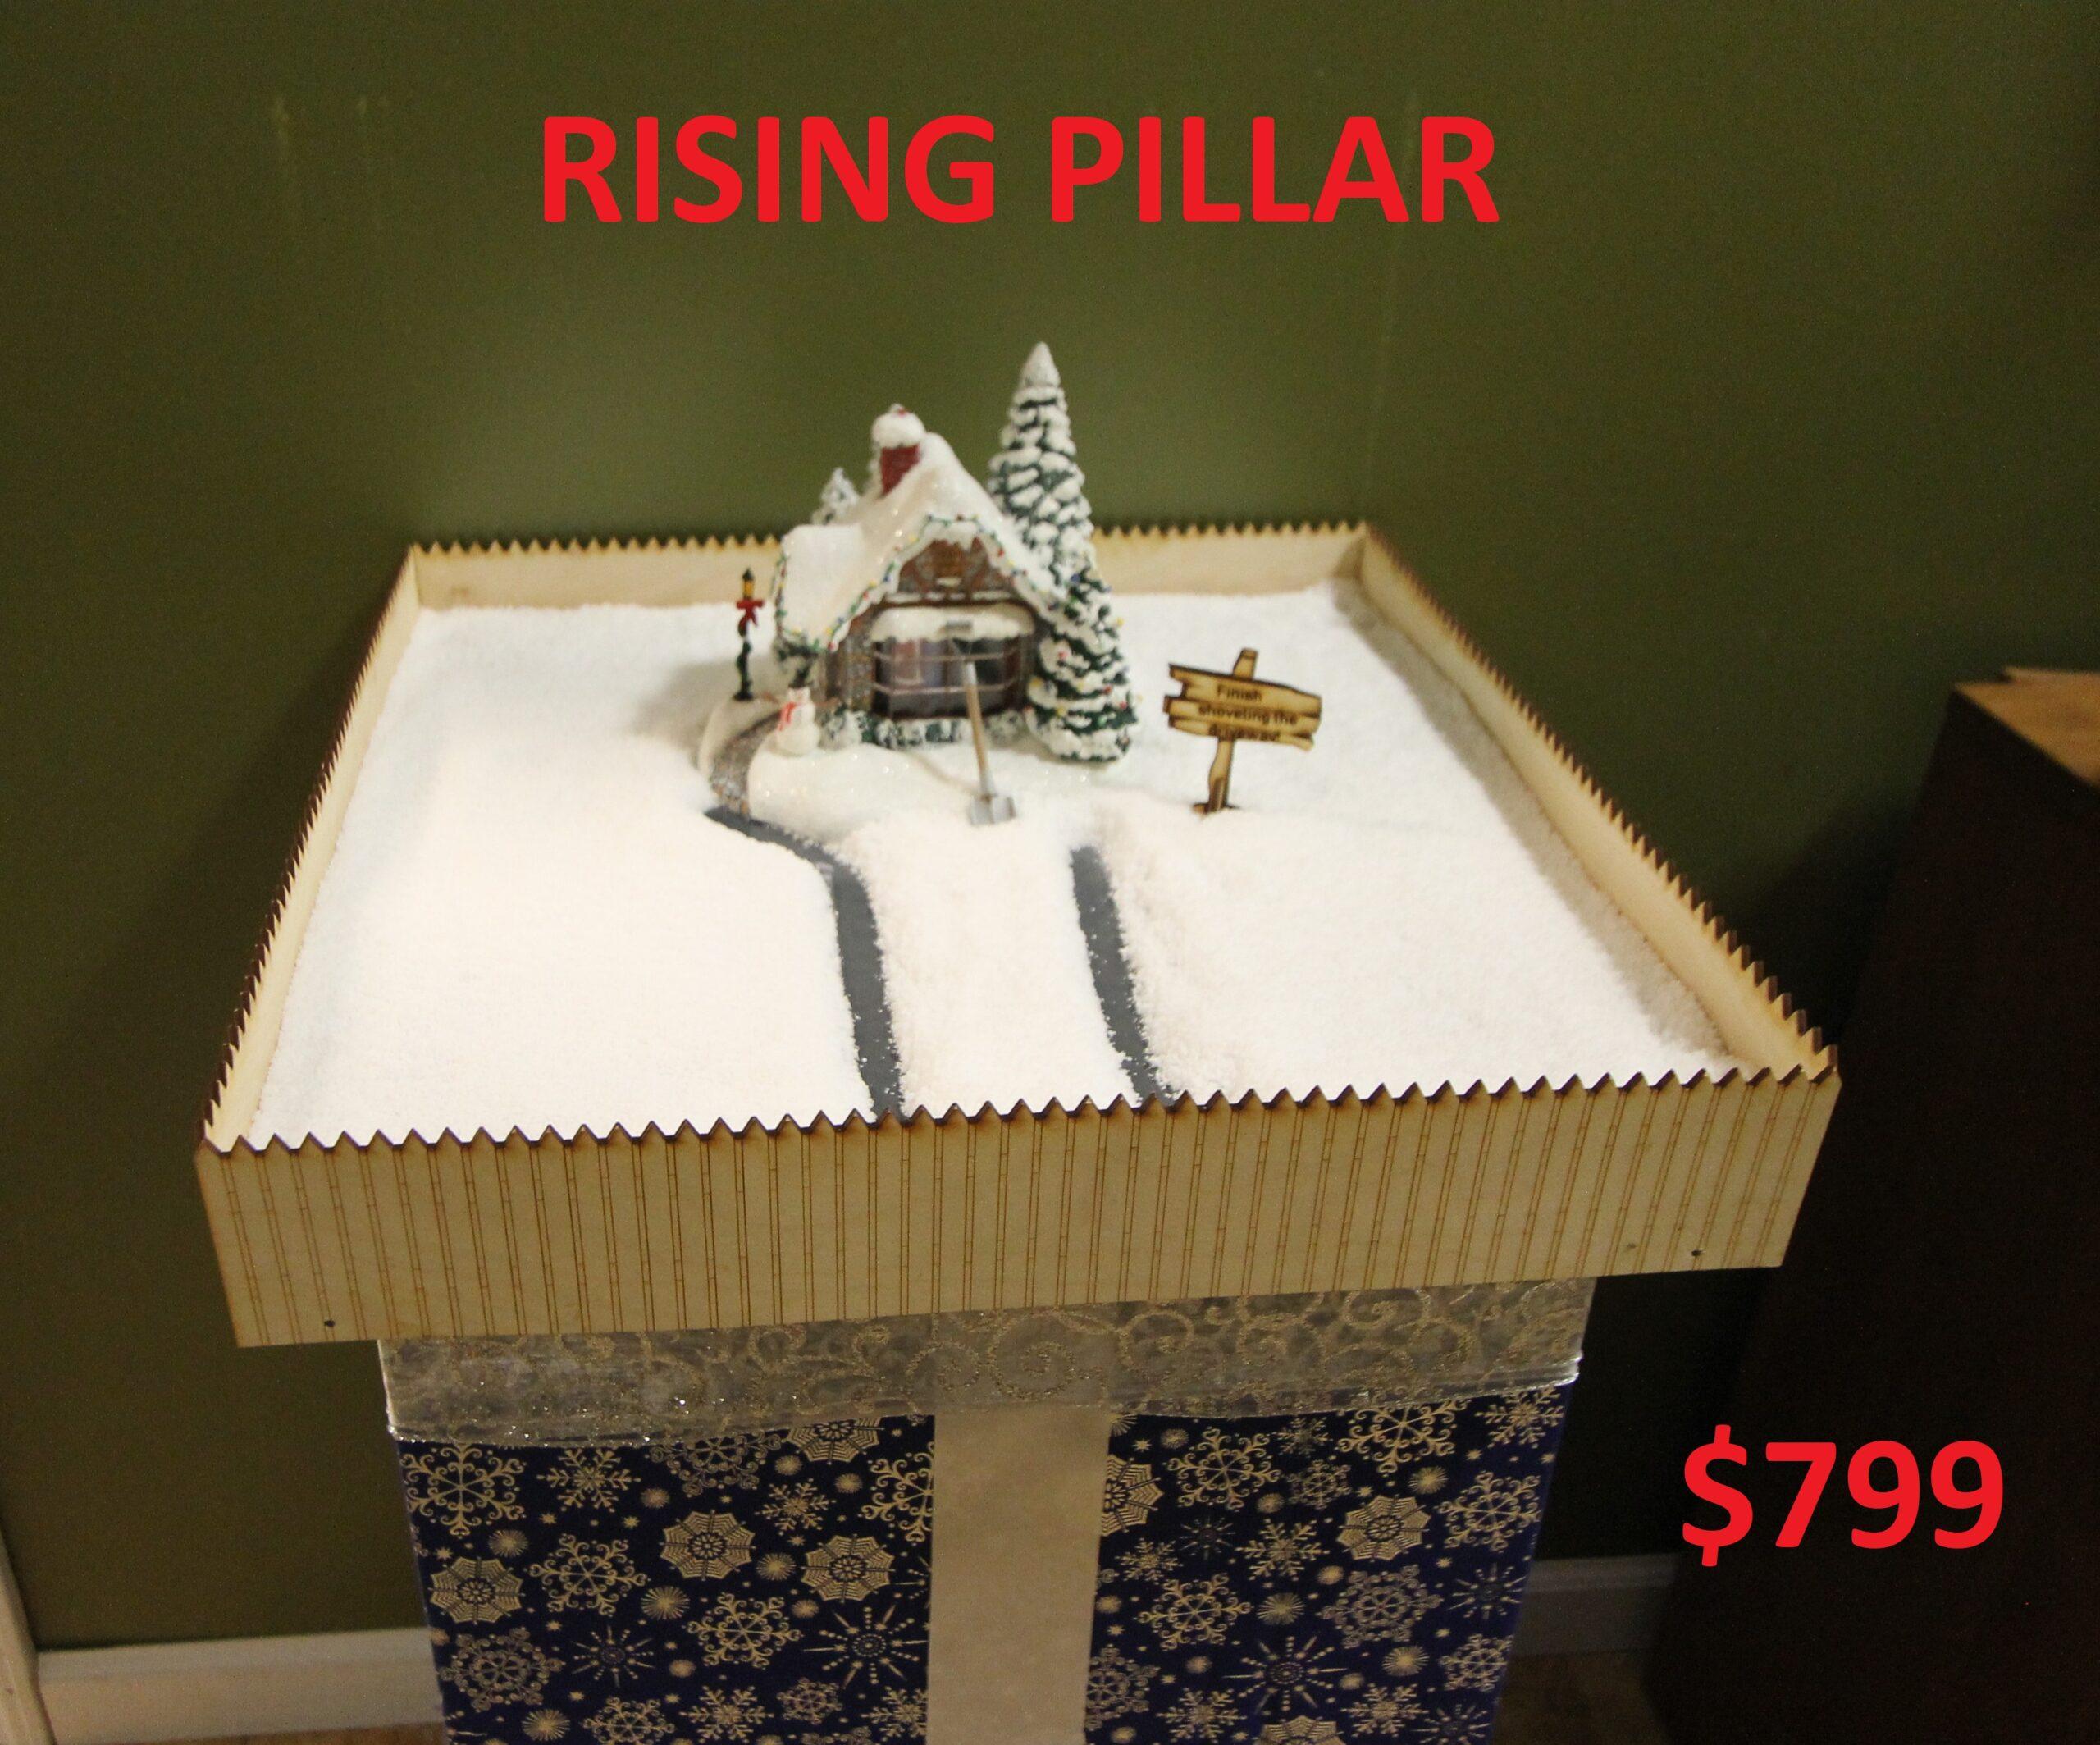 Rising Pillar Image